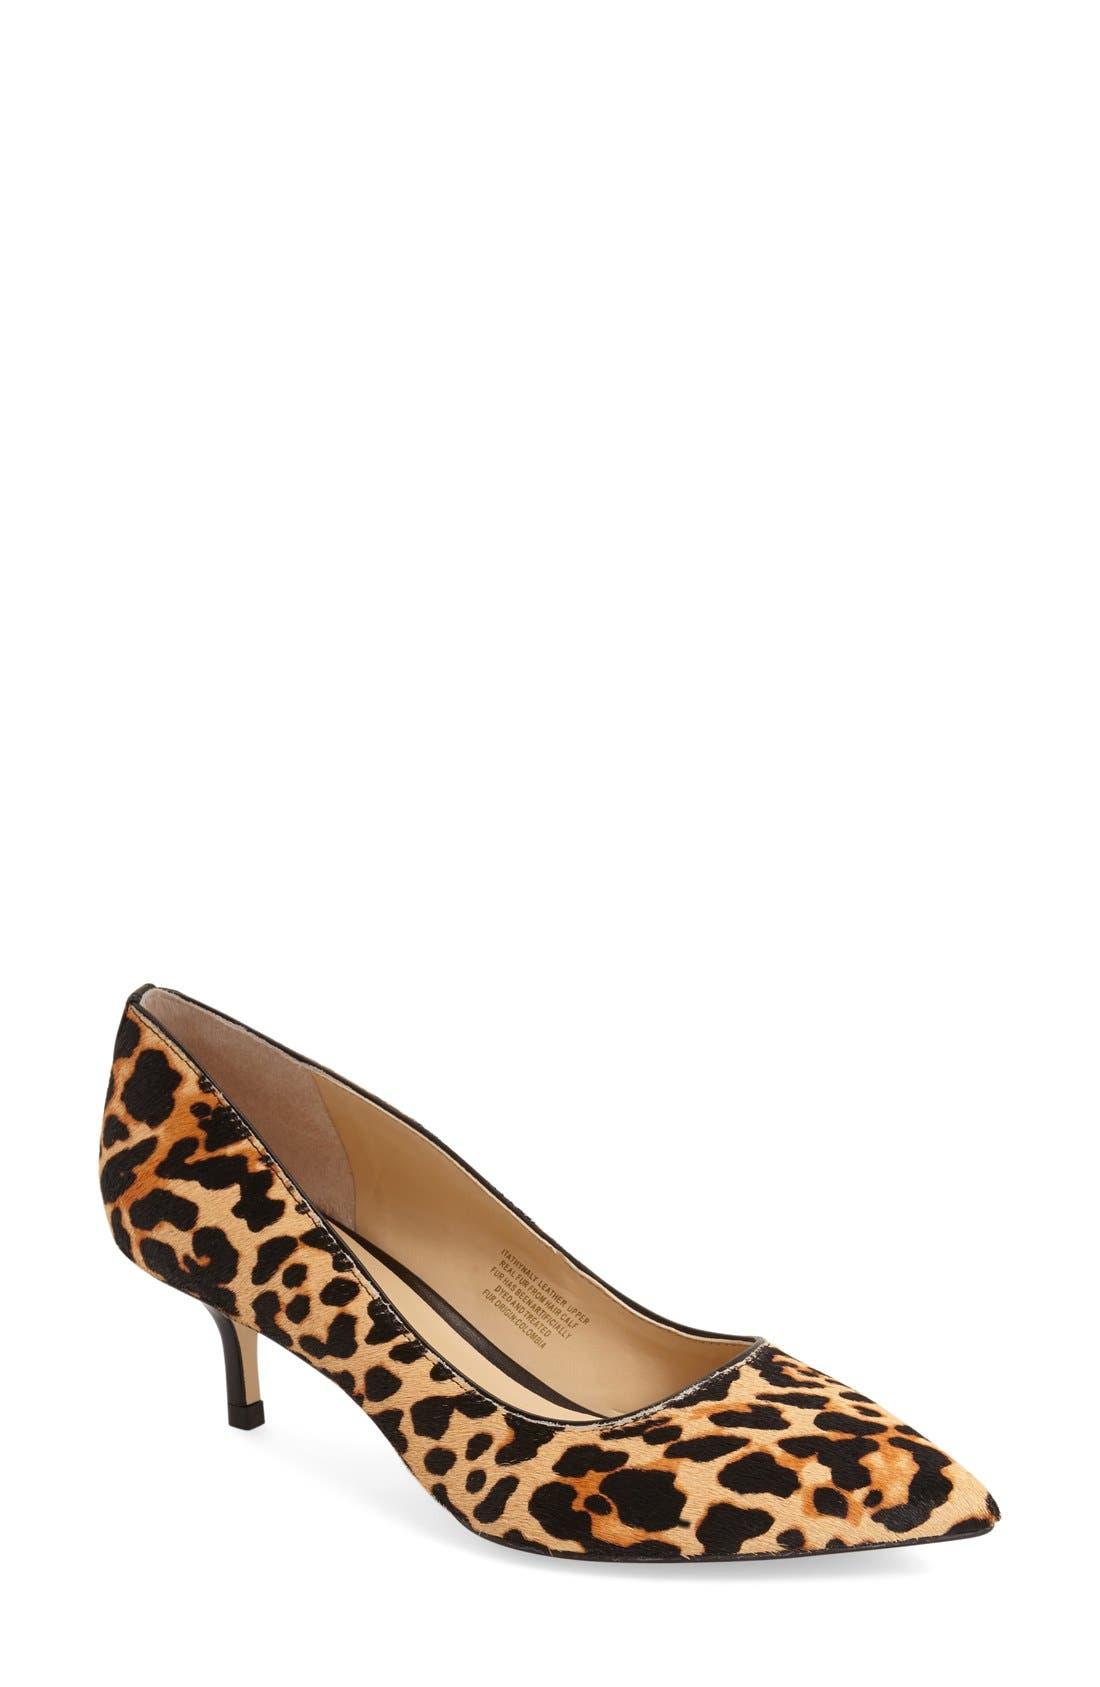 Alternate Image 1 Selected - Ivanka Trump 'Athynaly' Pointy Toe Genuine Calf Hair Pump (Women)